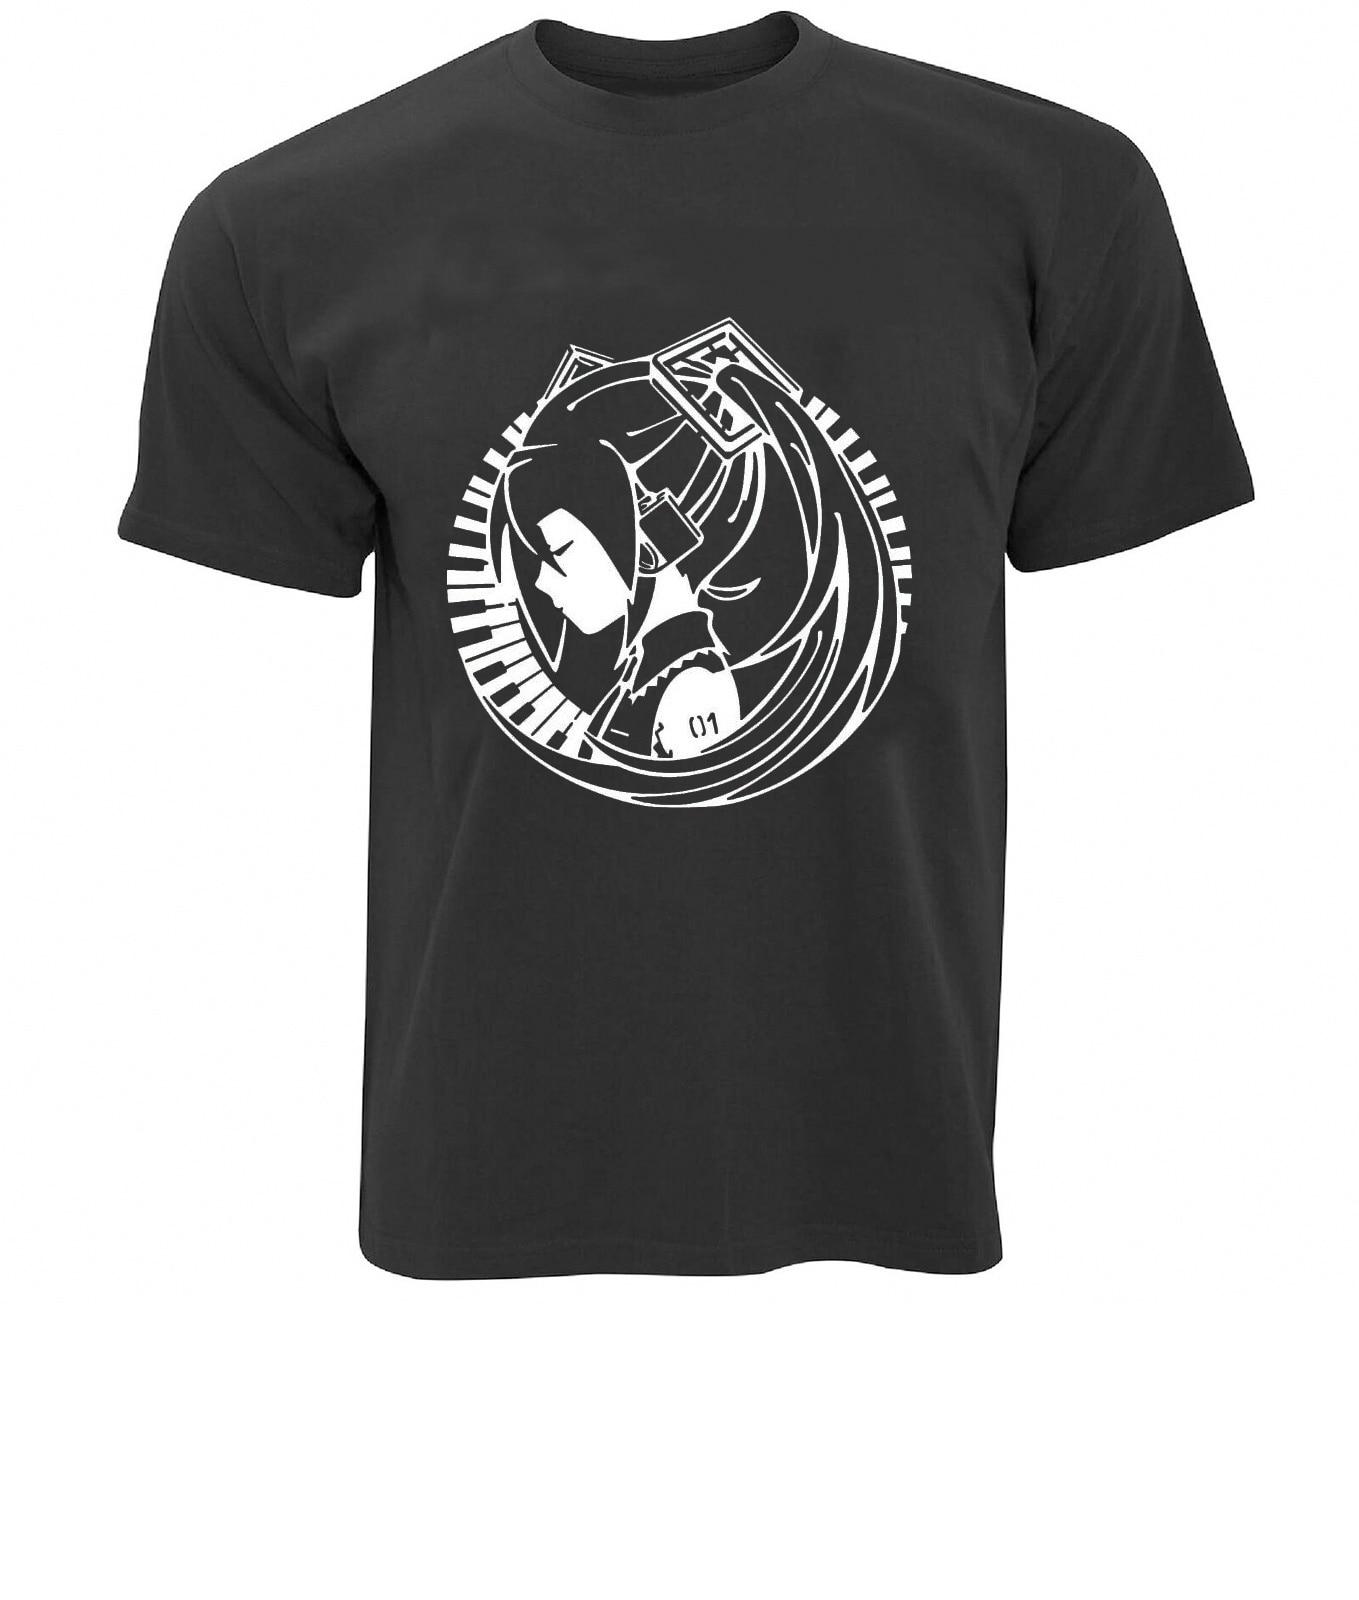 t-shirt-vocaloid-miku-anime-piano-manga-cosplay-evento-t-shirt-da-donna-s-3xl